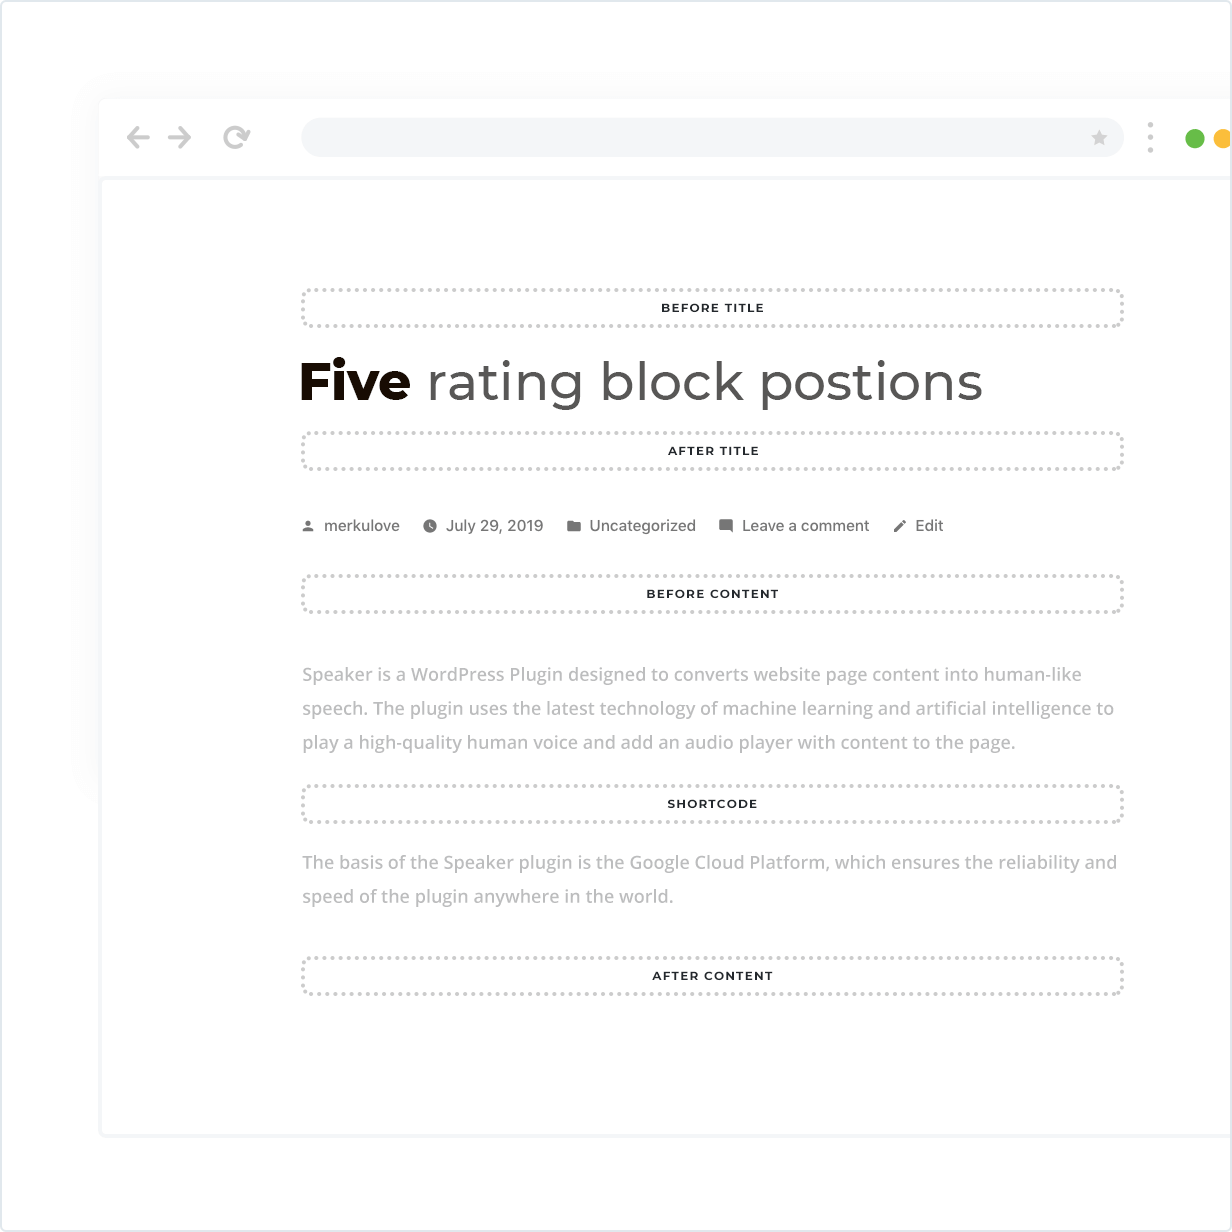 Five rating block position, widget and shortcode